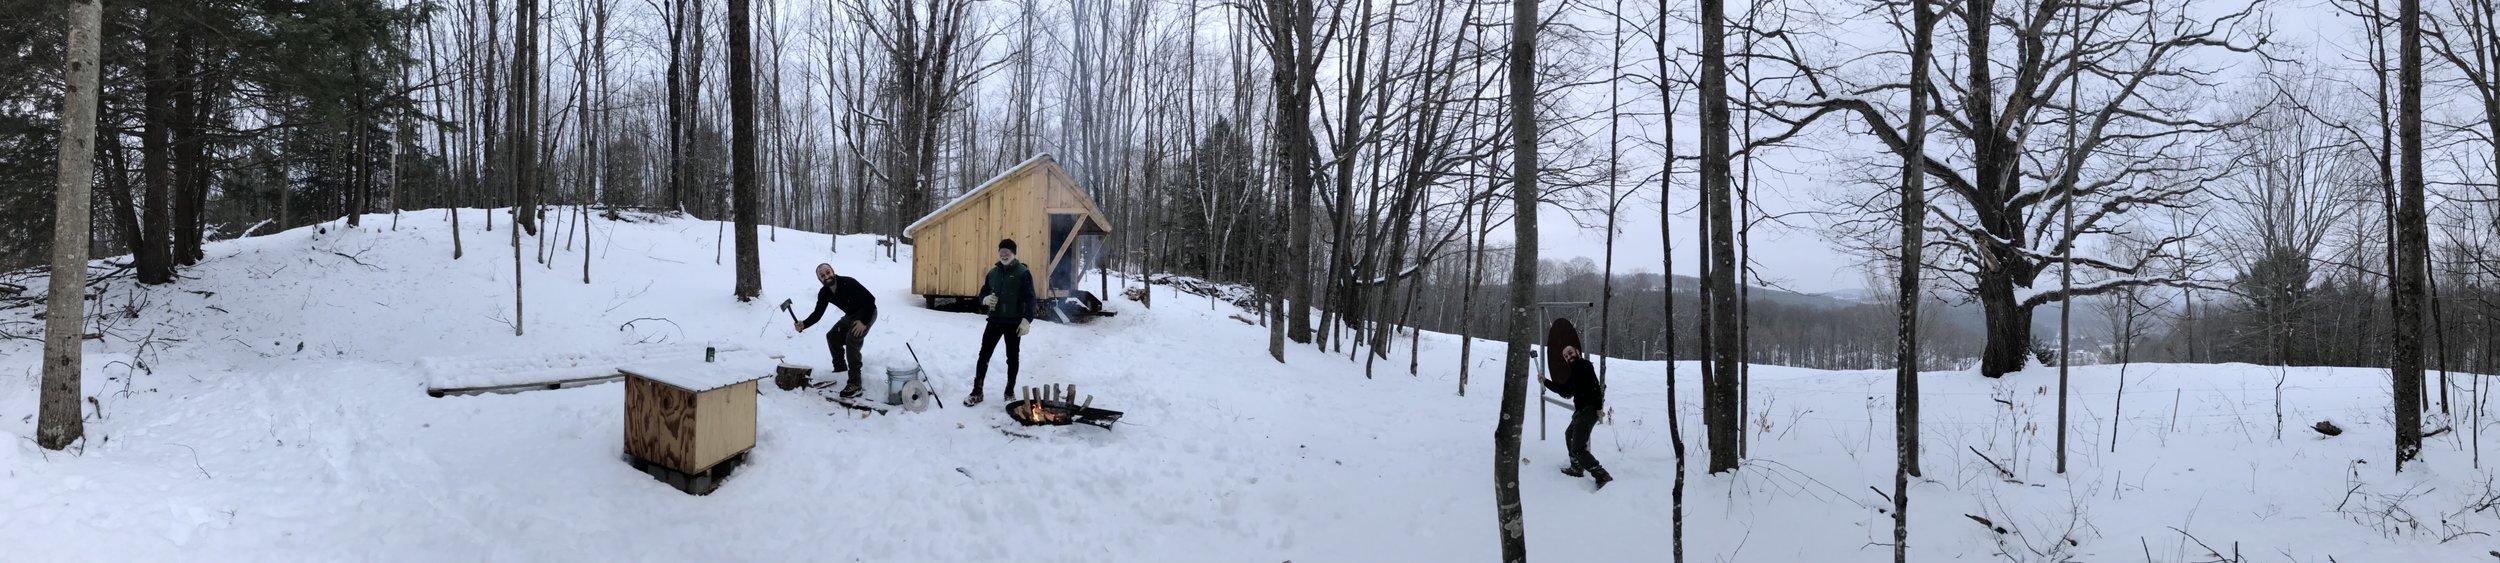 Winter camping!